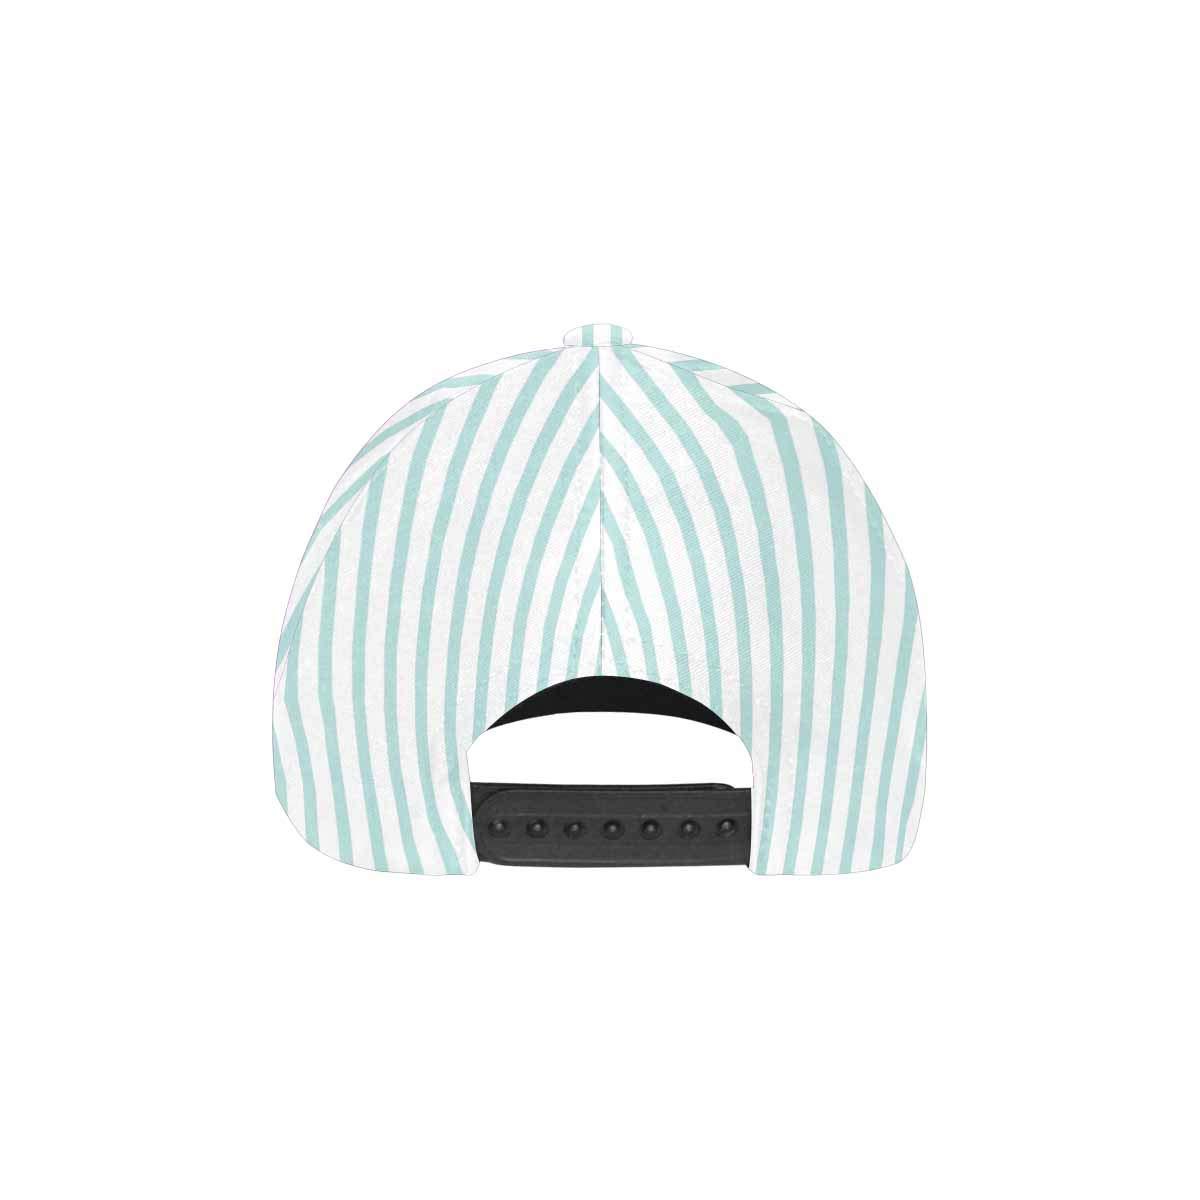 755a89ecd6ed Amazon.com: InterestPrint Abstract Fashion Mint and White Stripes ...